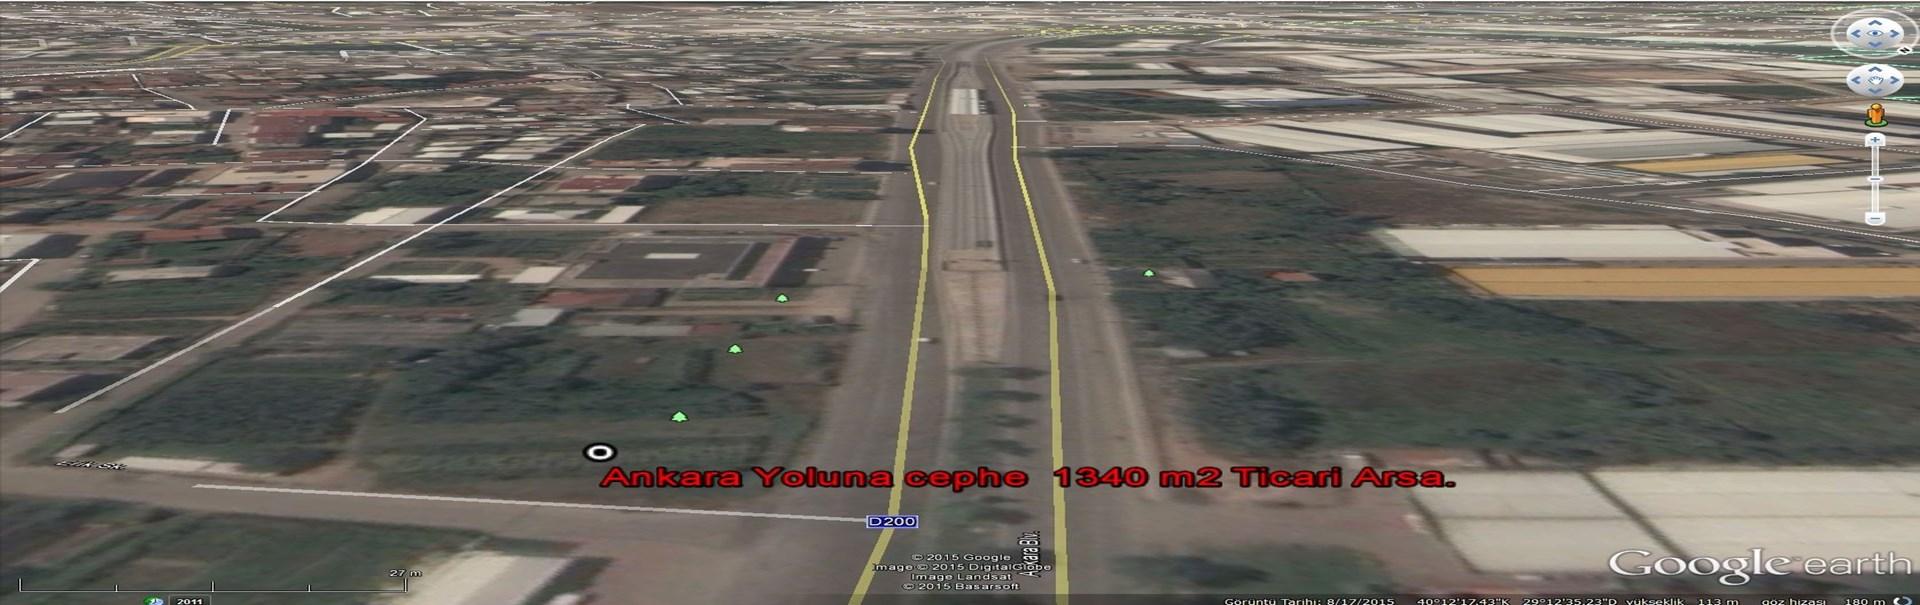 Ankara Yoluna cephe 1.340 m2 Ticari Arsa.